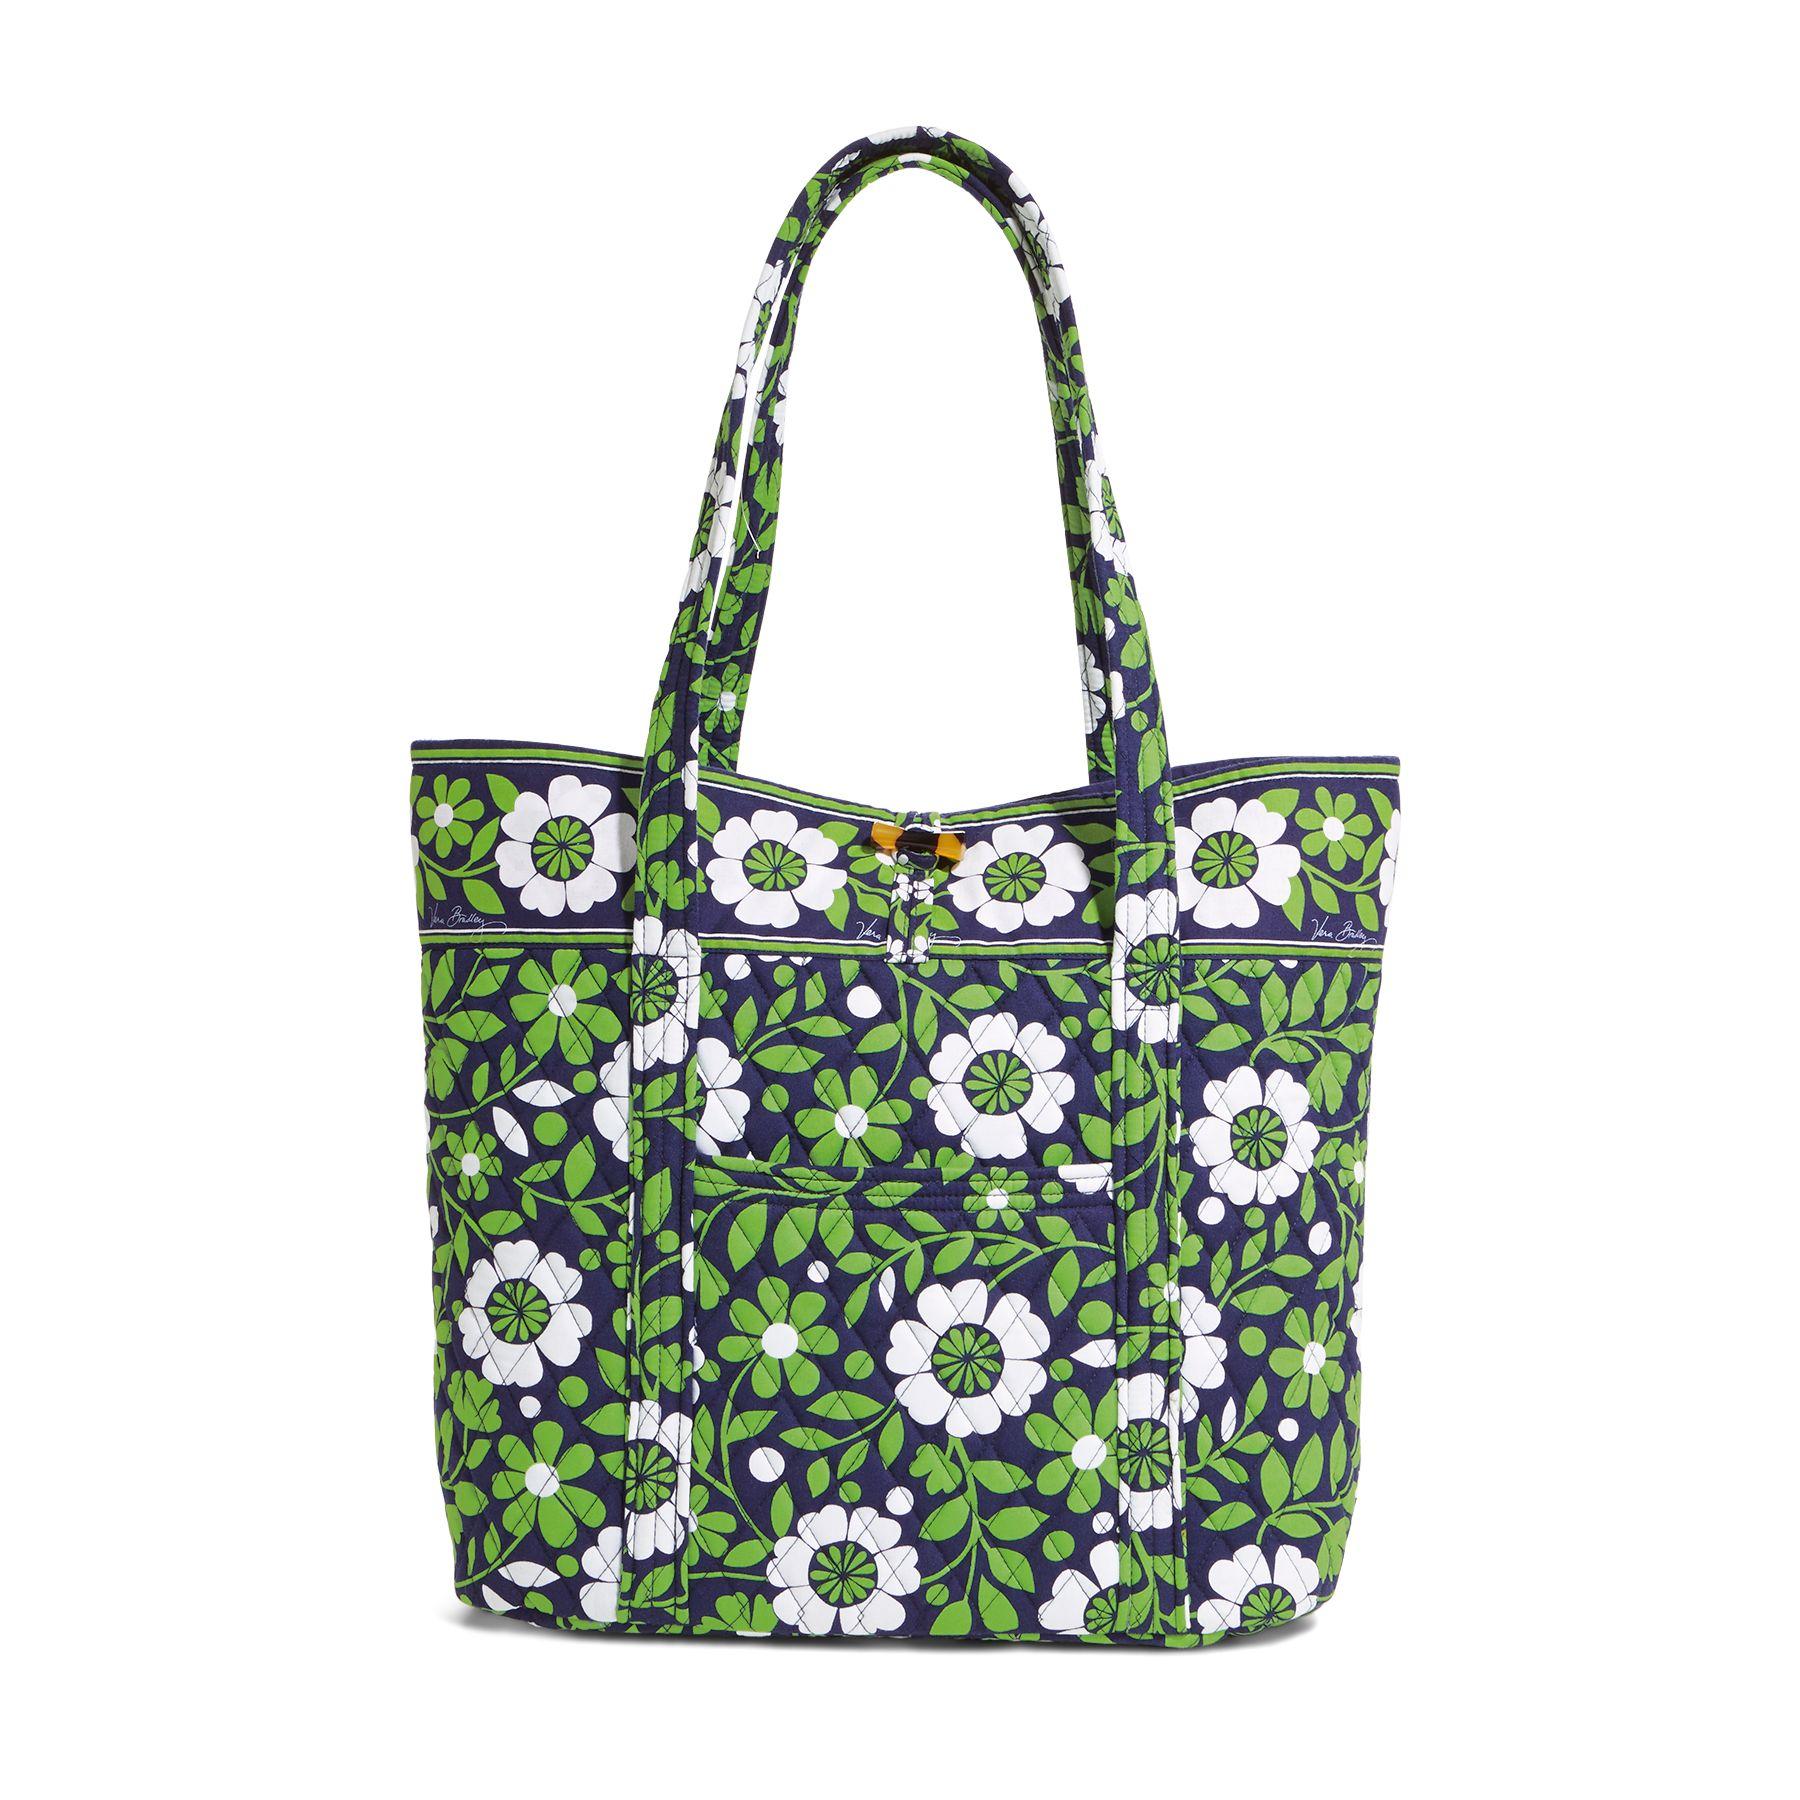 Vera Bradley Travel Tote Bag